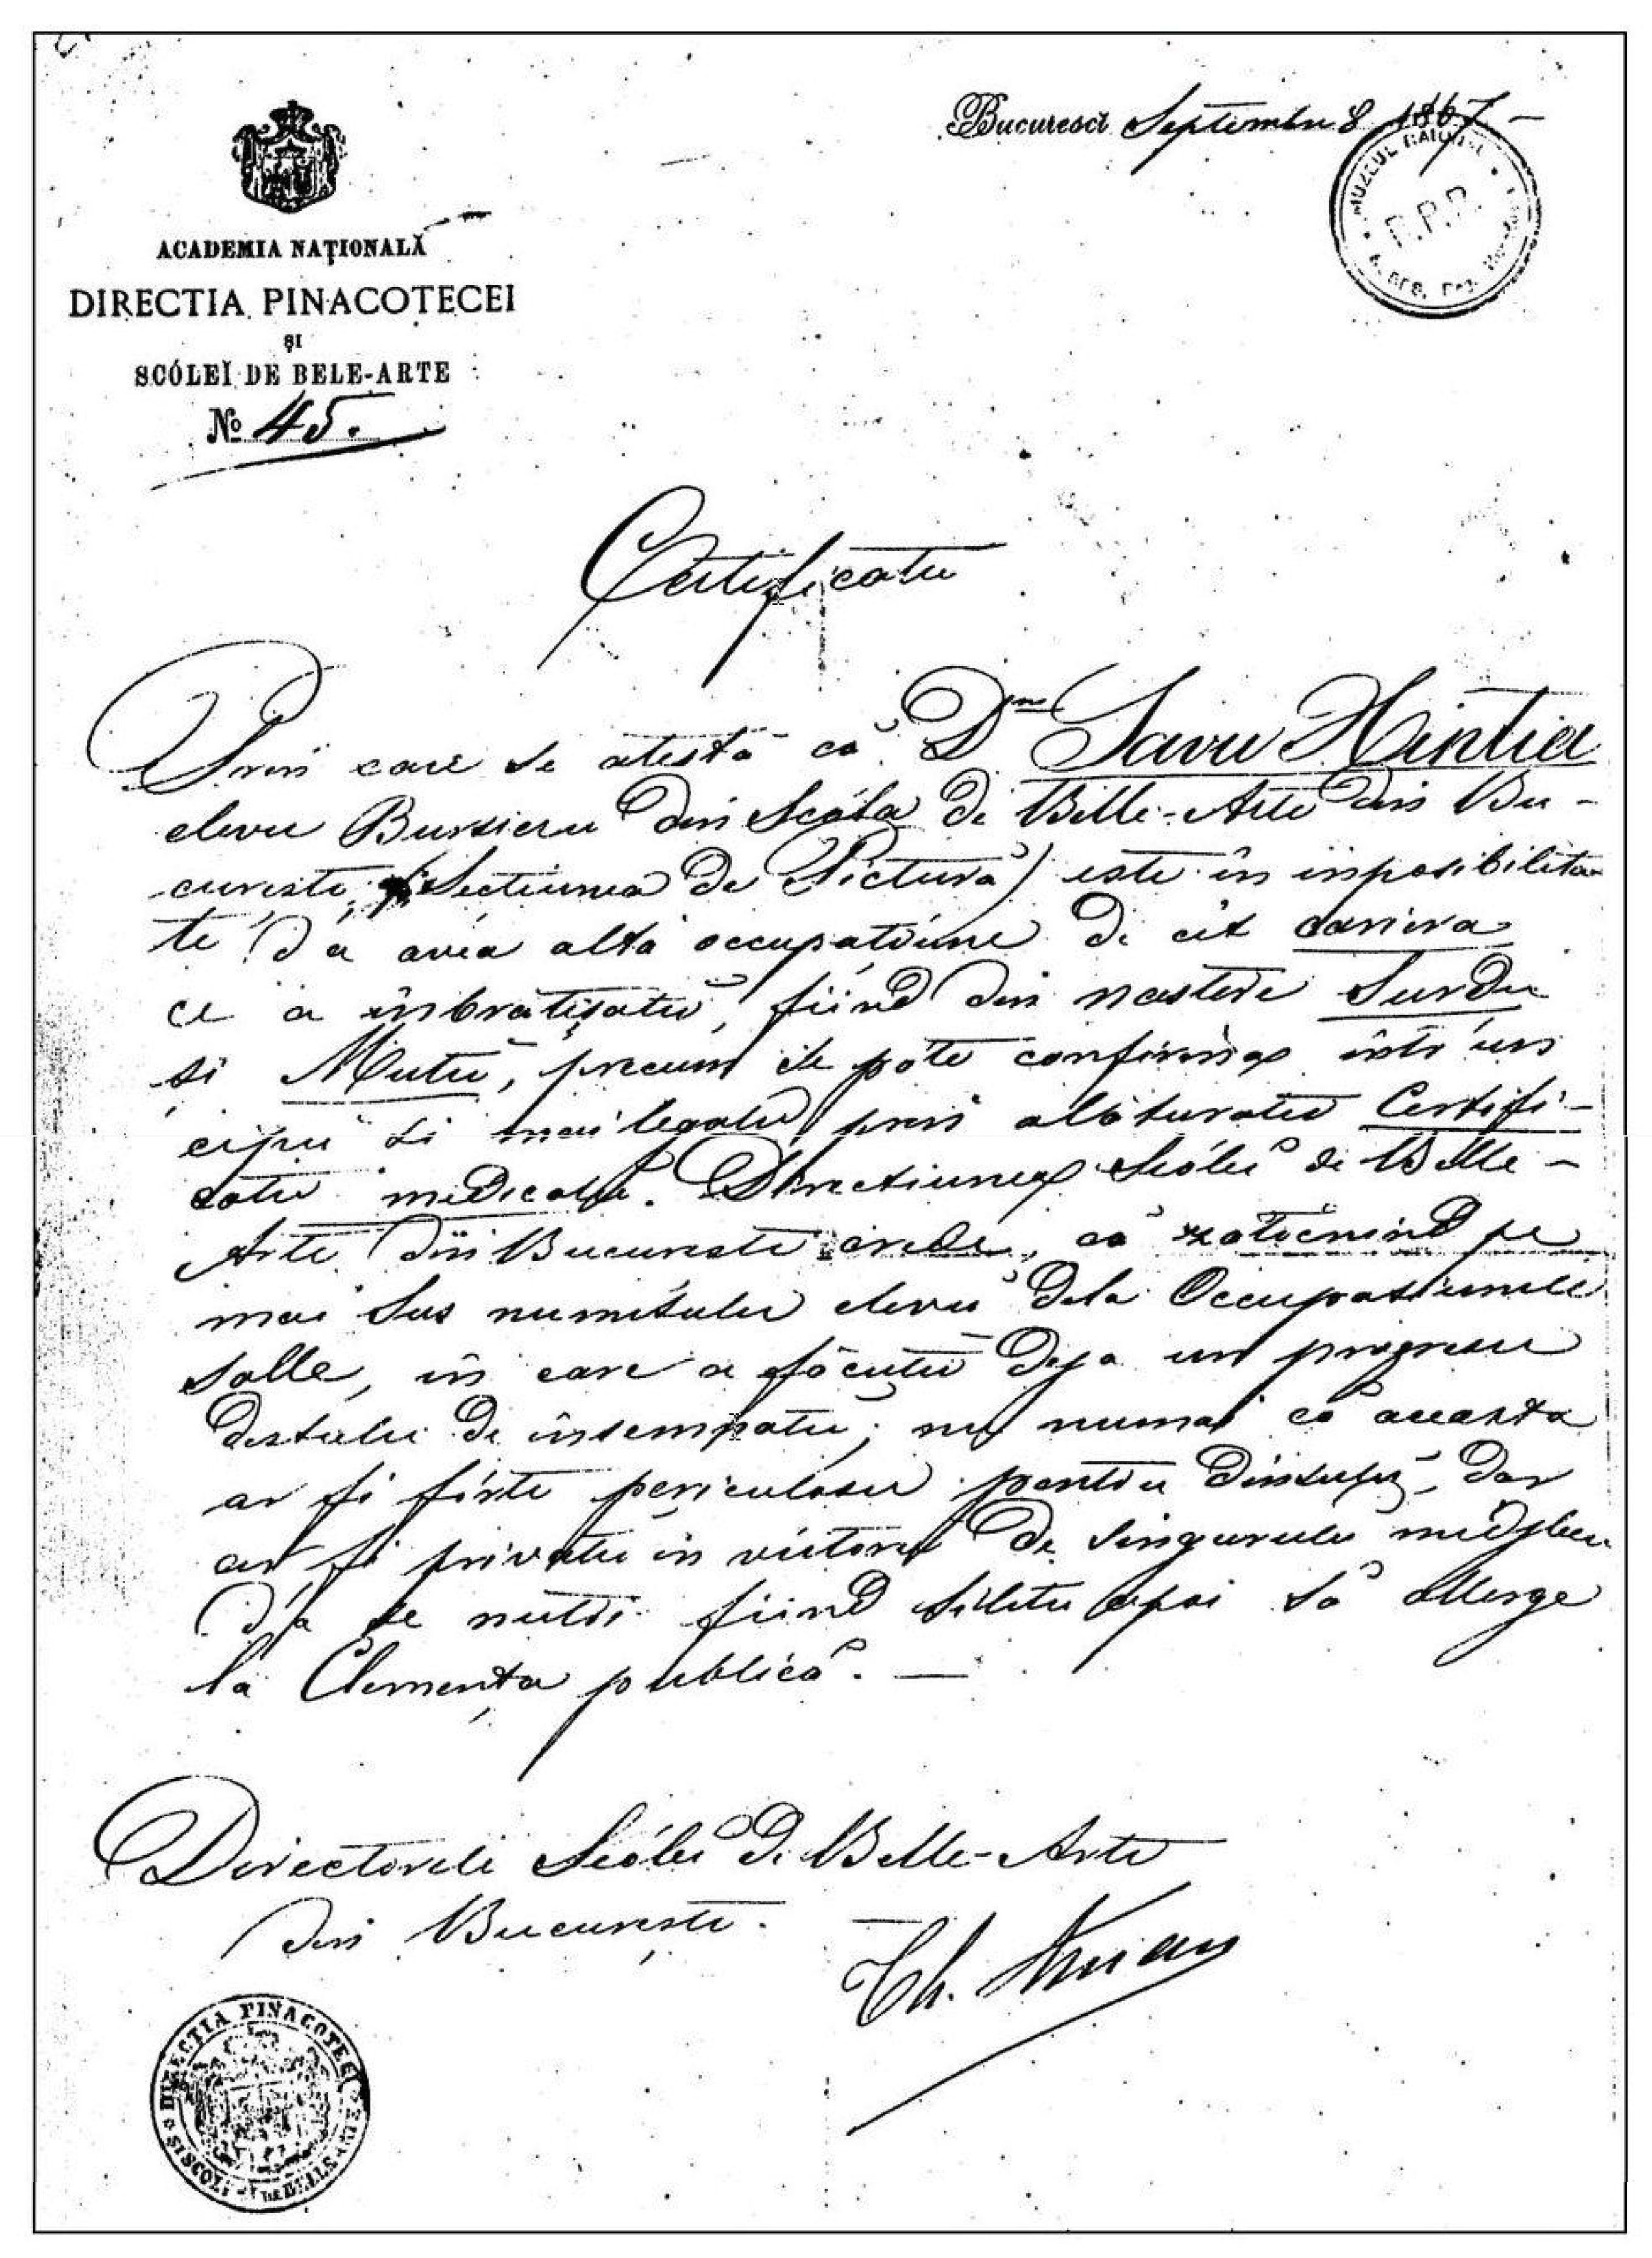 Hentia Pics in file:sava hentia - certificat medical - wikimedia commons